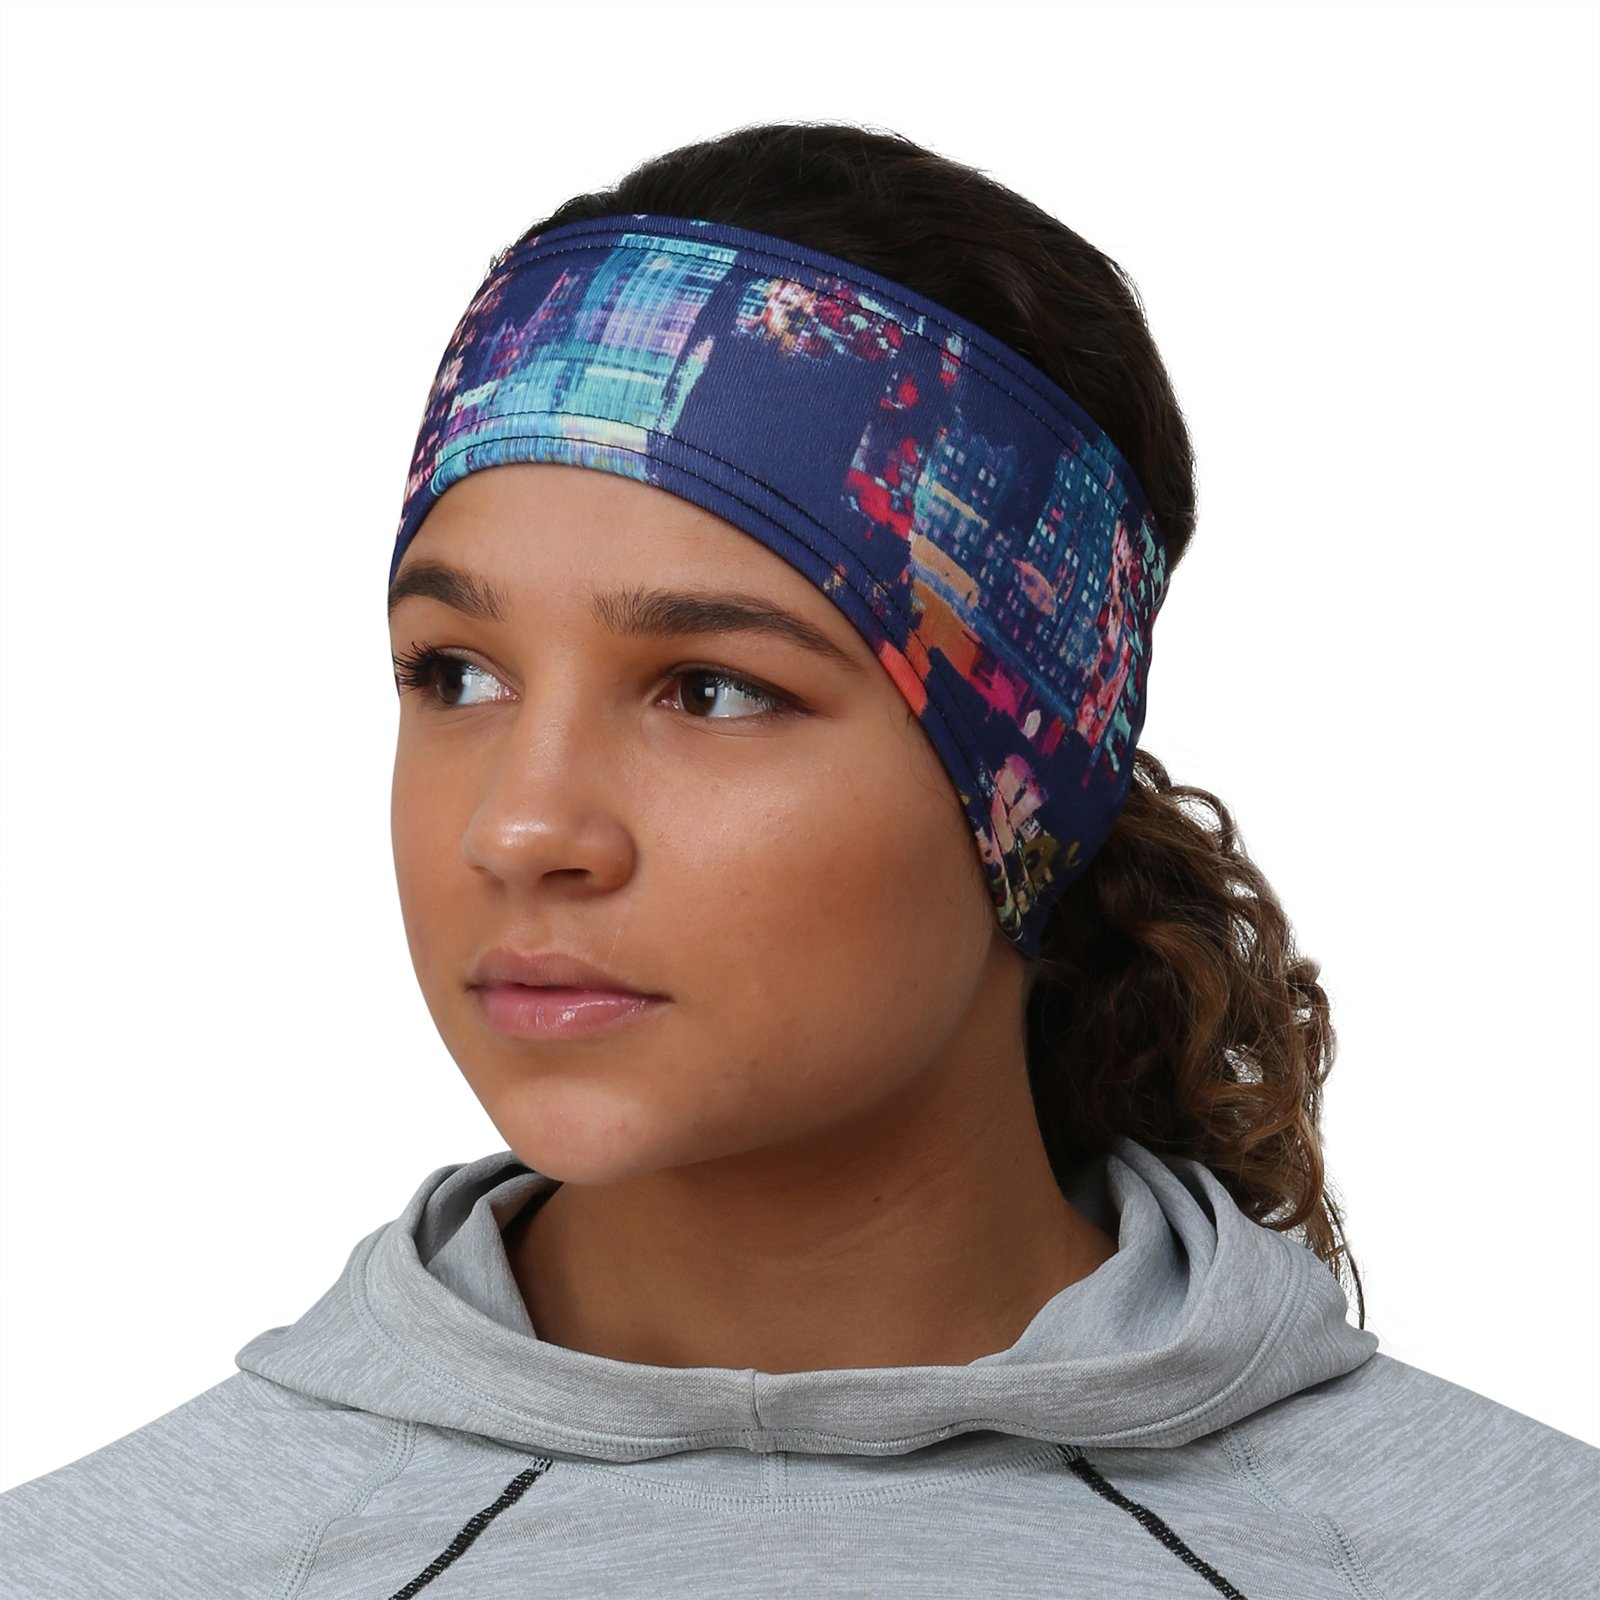 TrailHeads Women's Print Ponytail Headband – 12 Prints - Made in USA - Cityscape